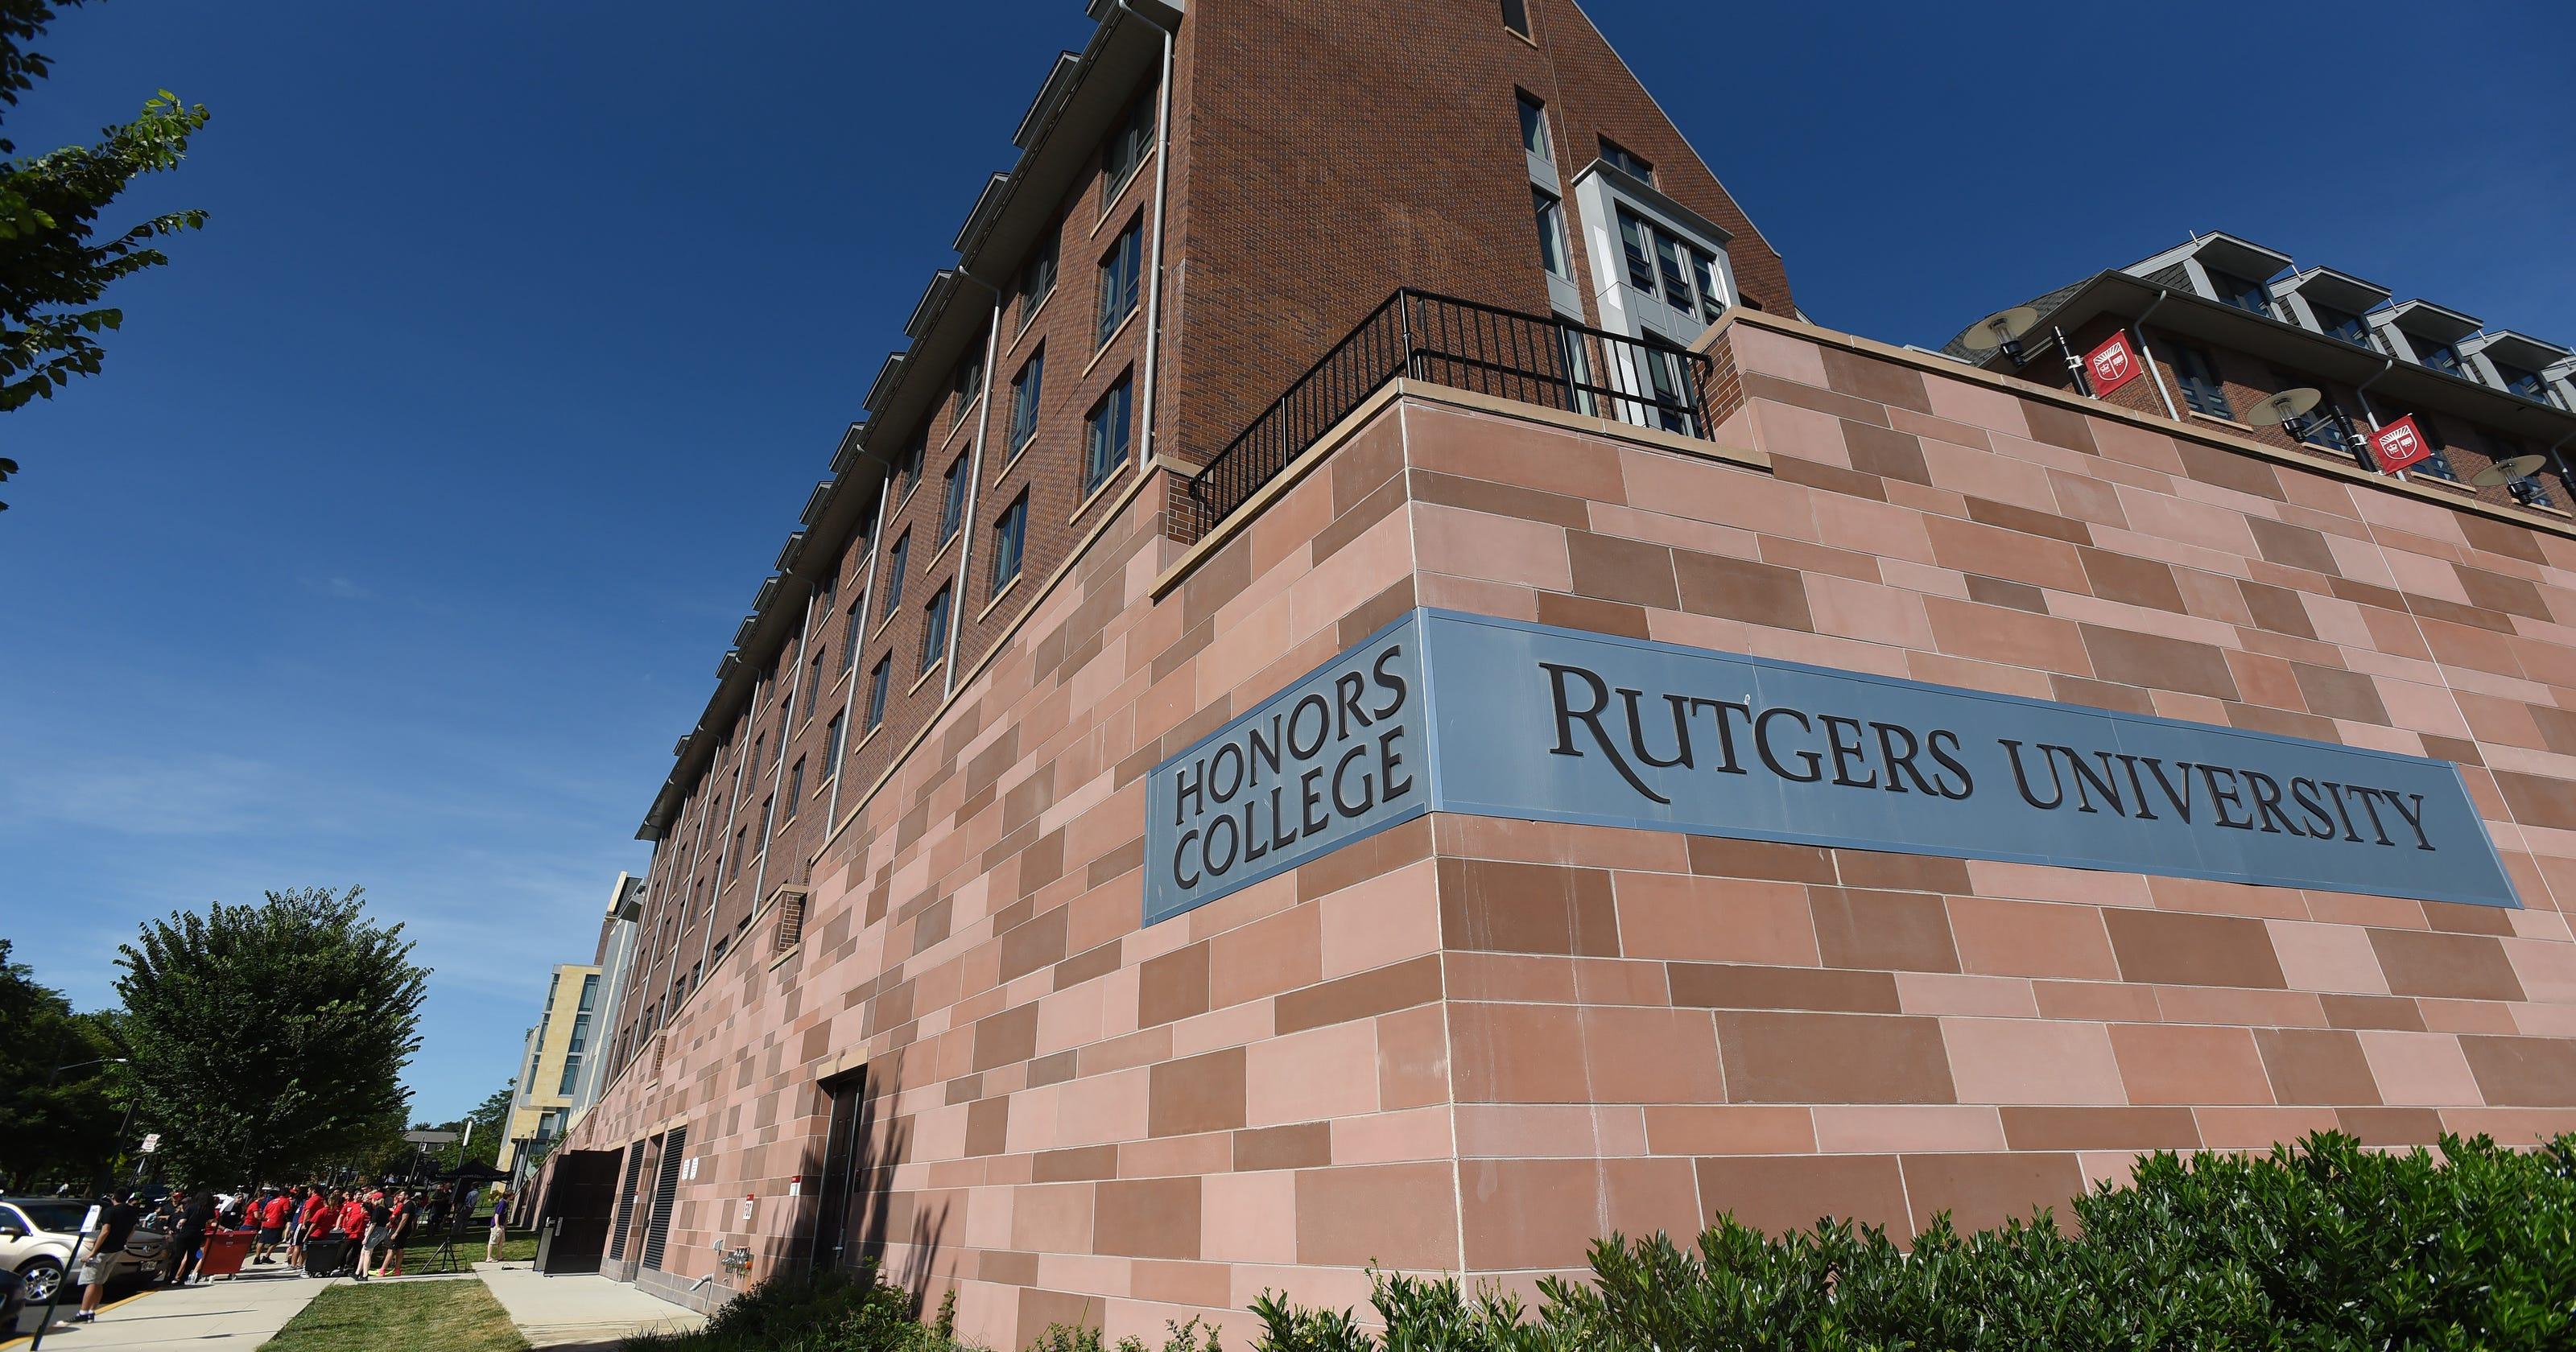 Case against Rutgers alleging atmosphere of anti-Semitism